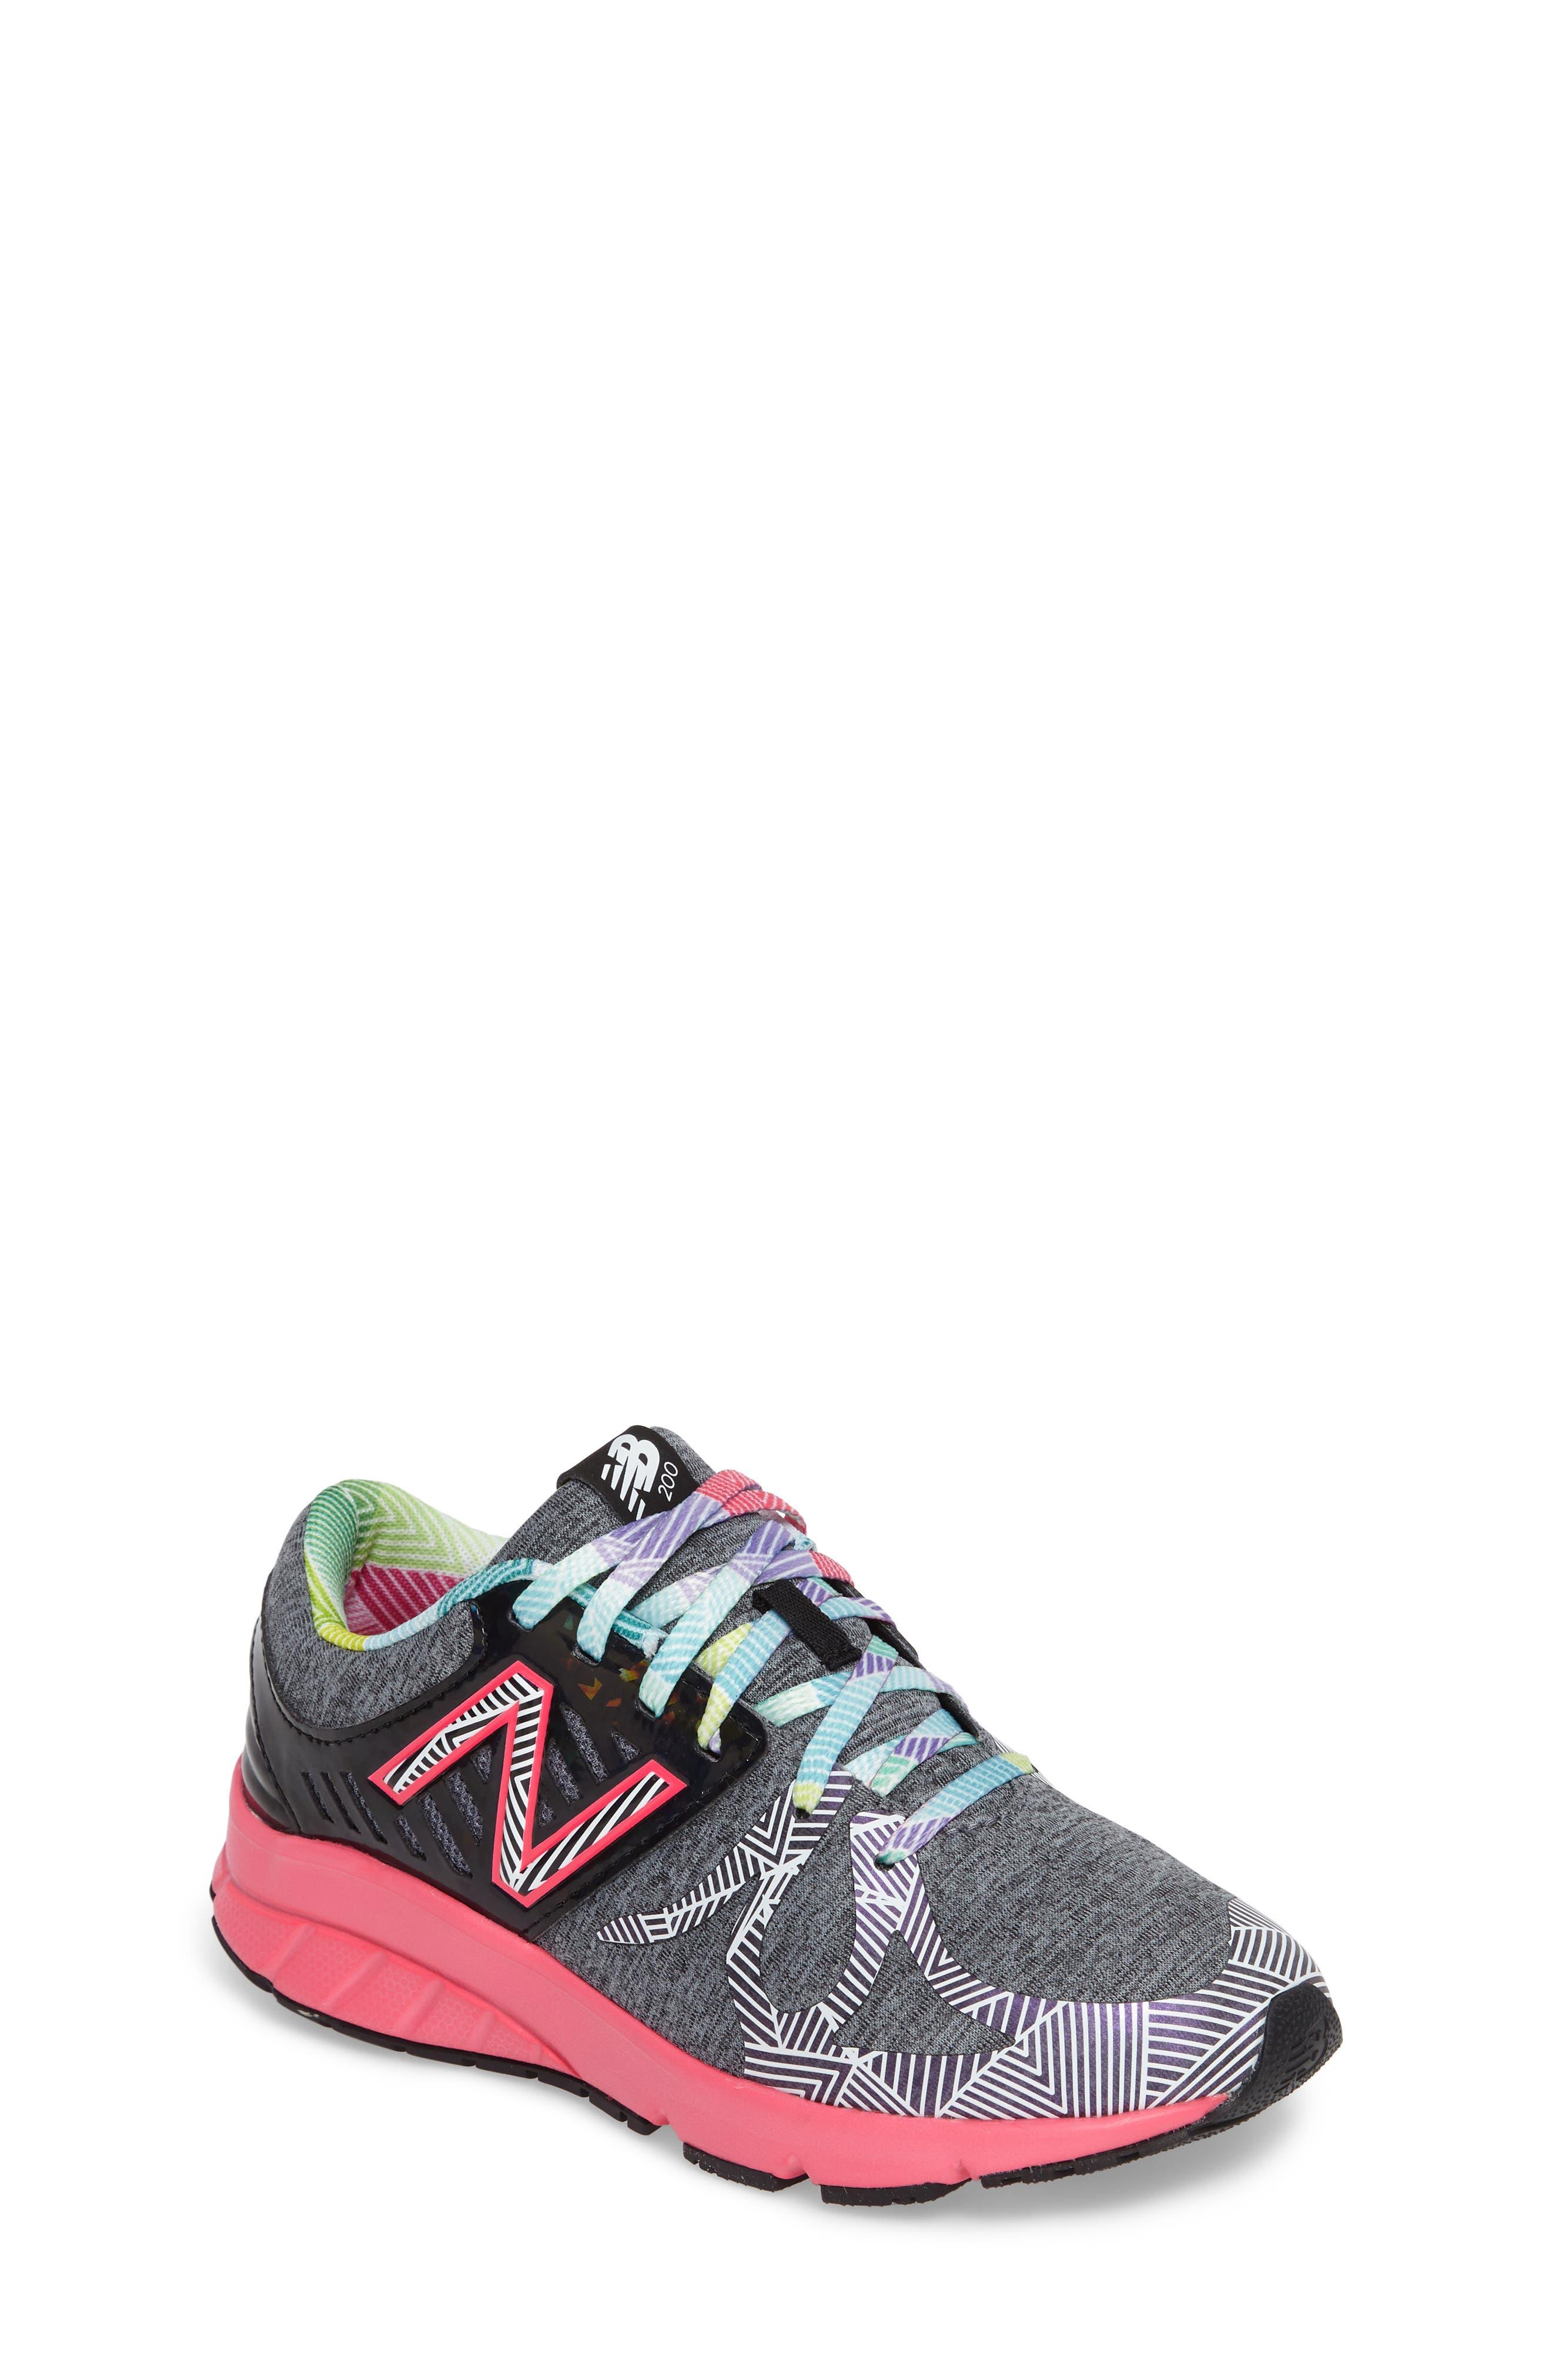 NEW BALANCE 200 Electric Rainbow Athletic Shoe